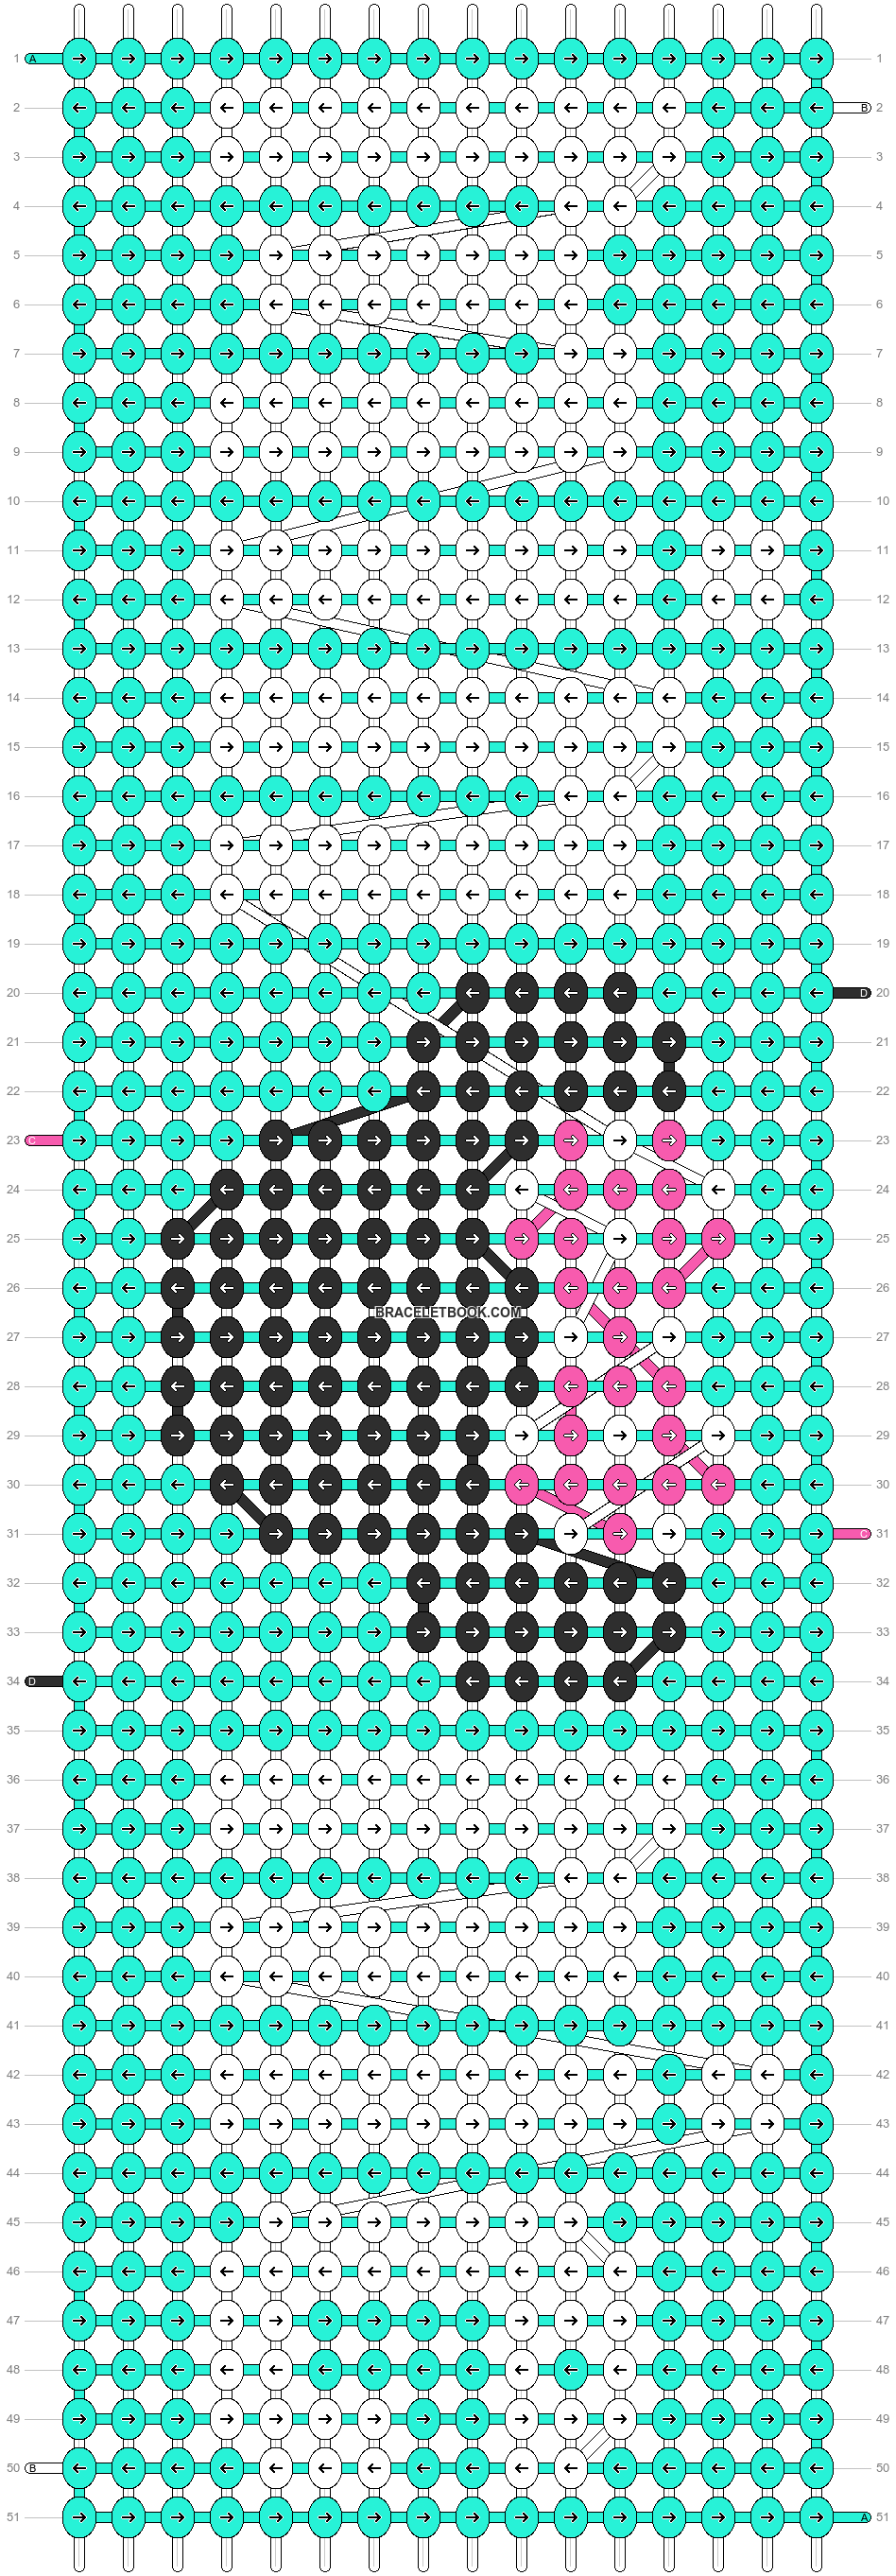 Alpha pattern #16620 pattern